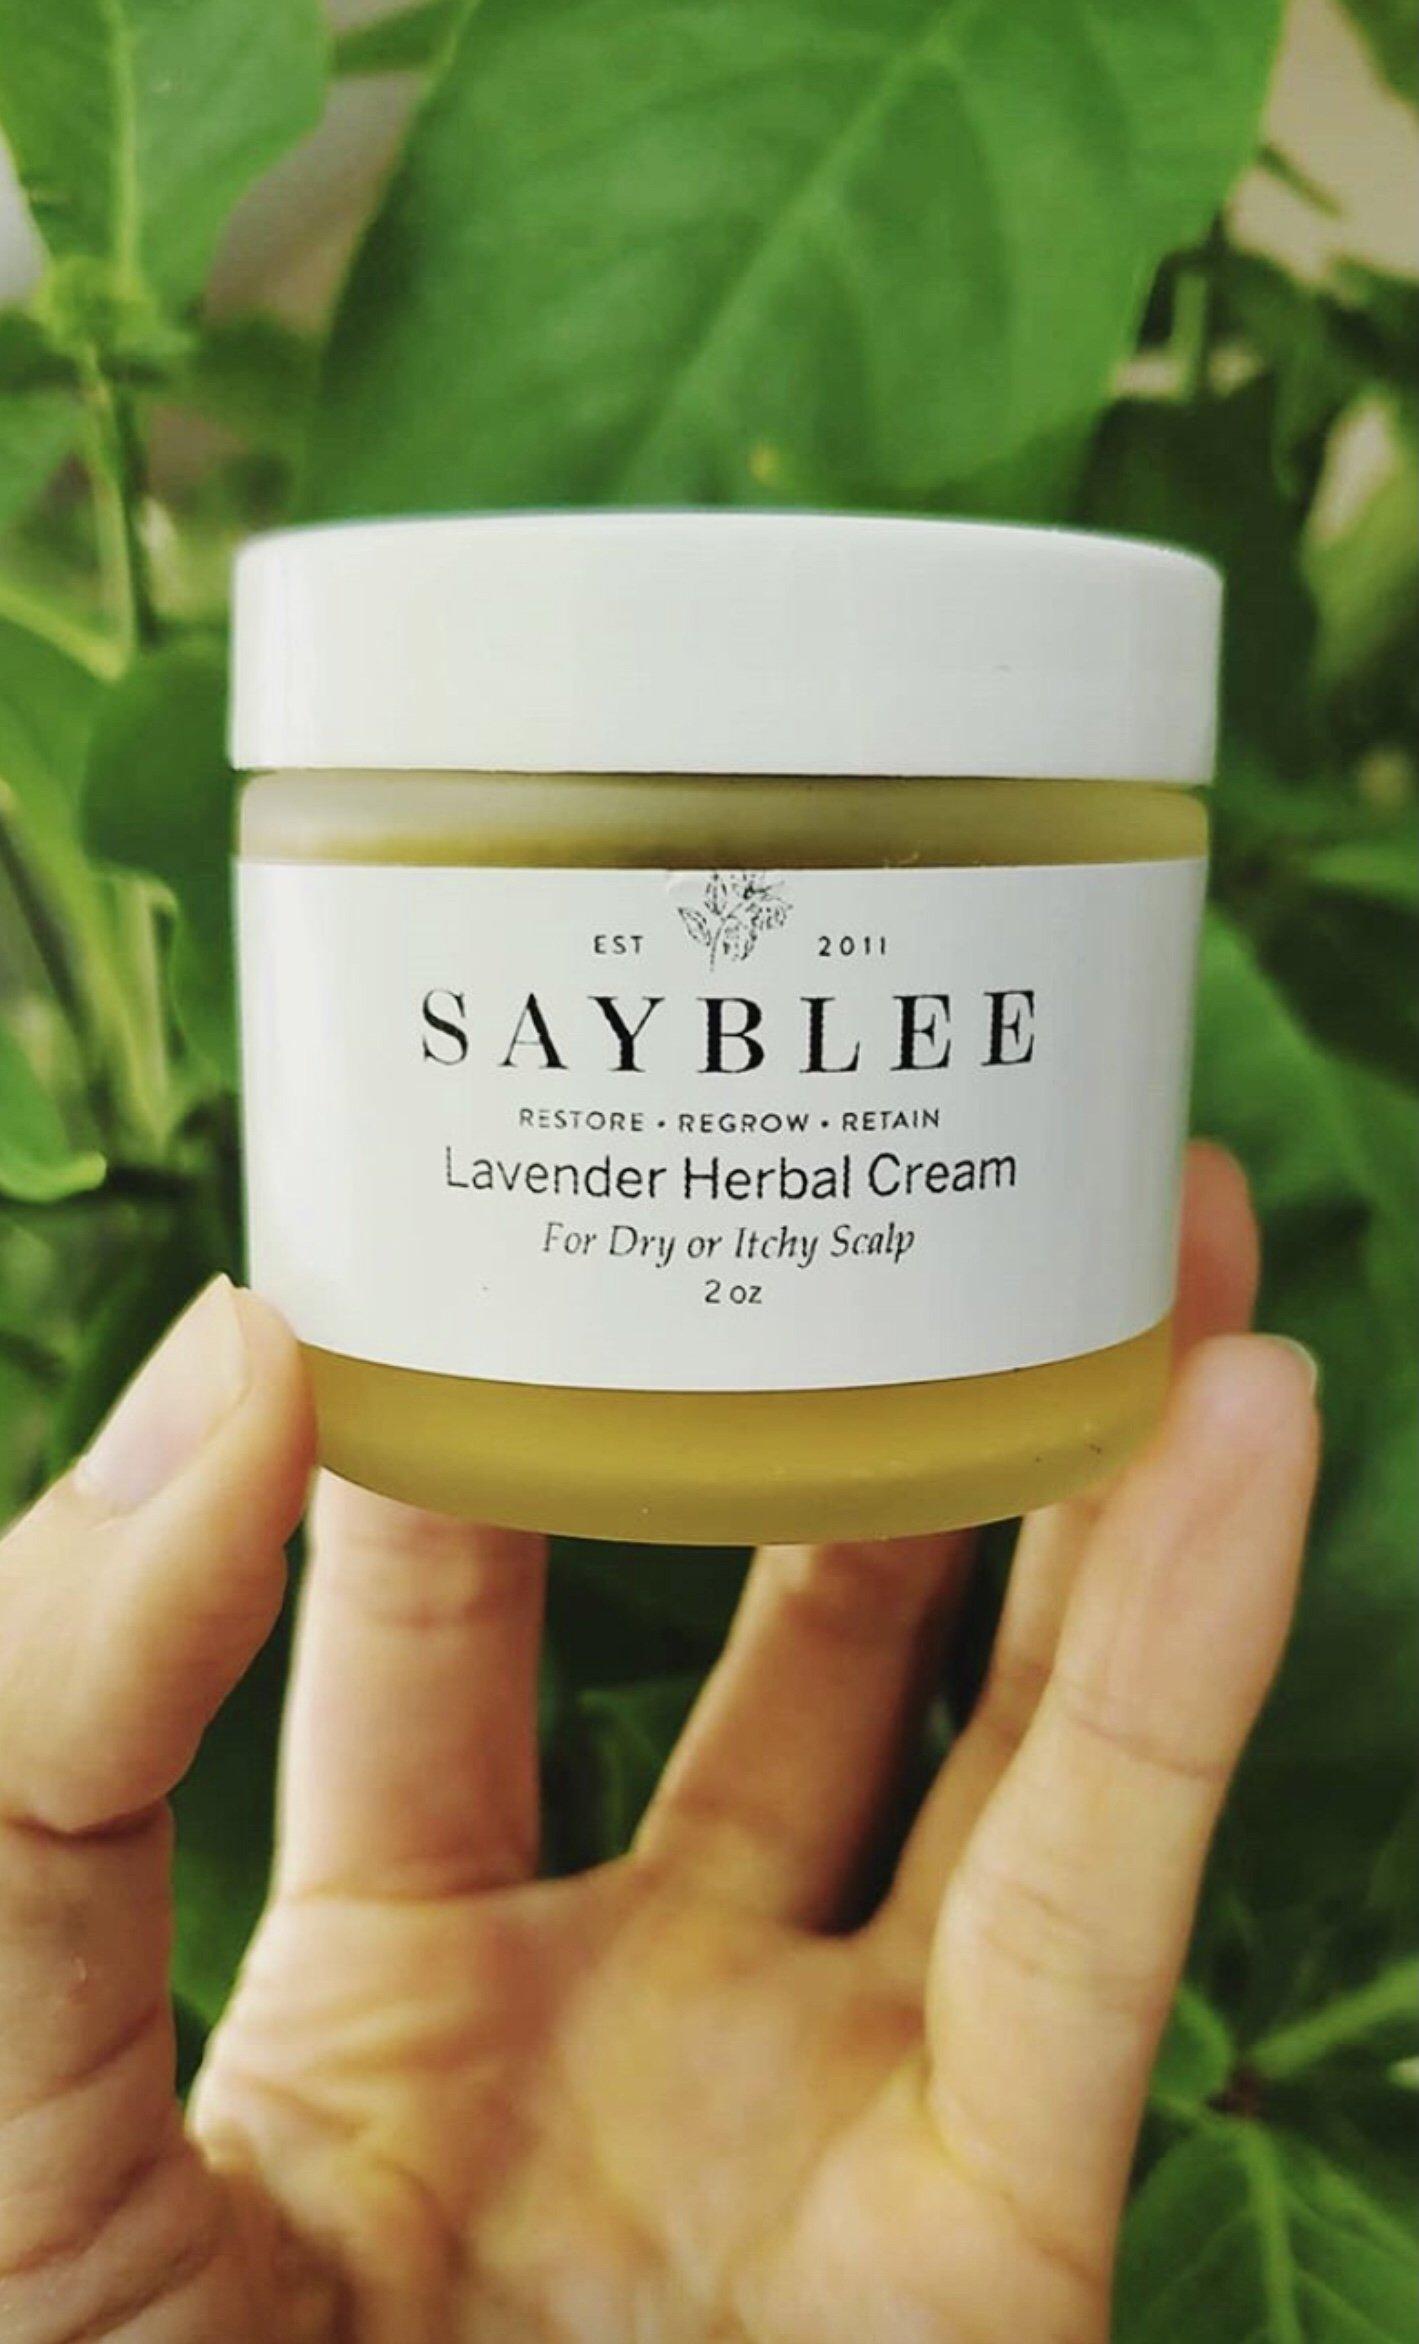 Lavender Herbal Cream